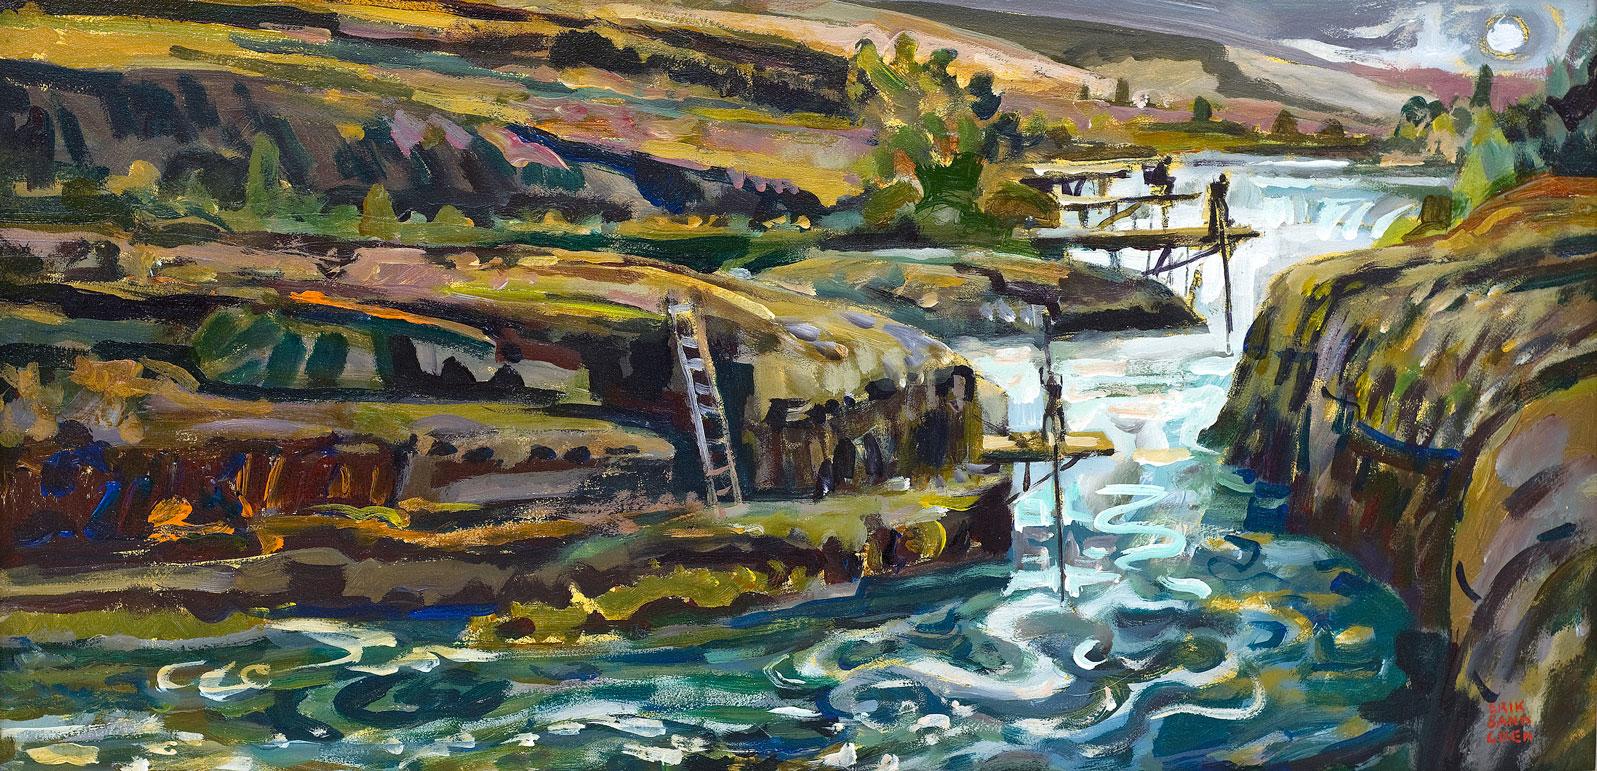 Erik Sandgren's winning painting